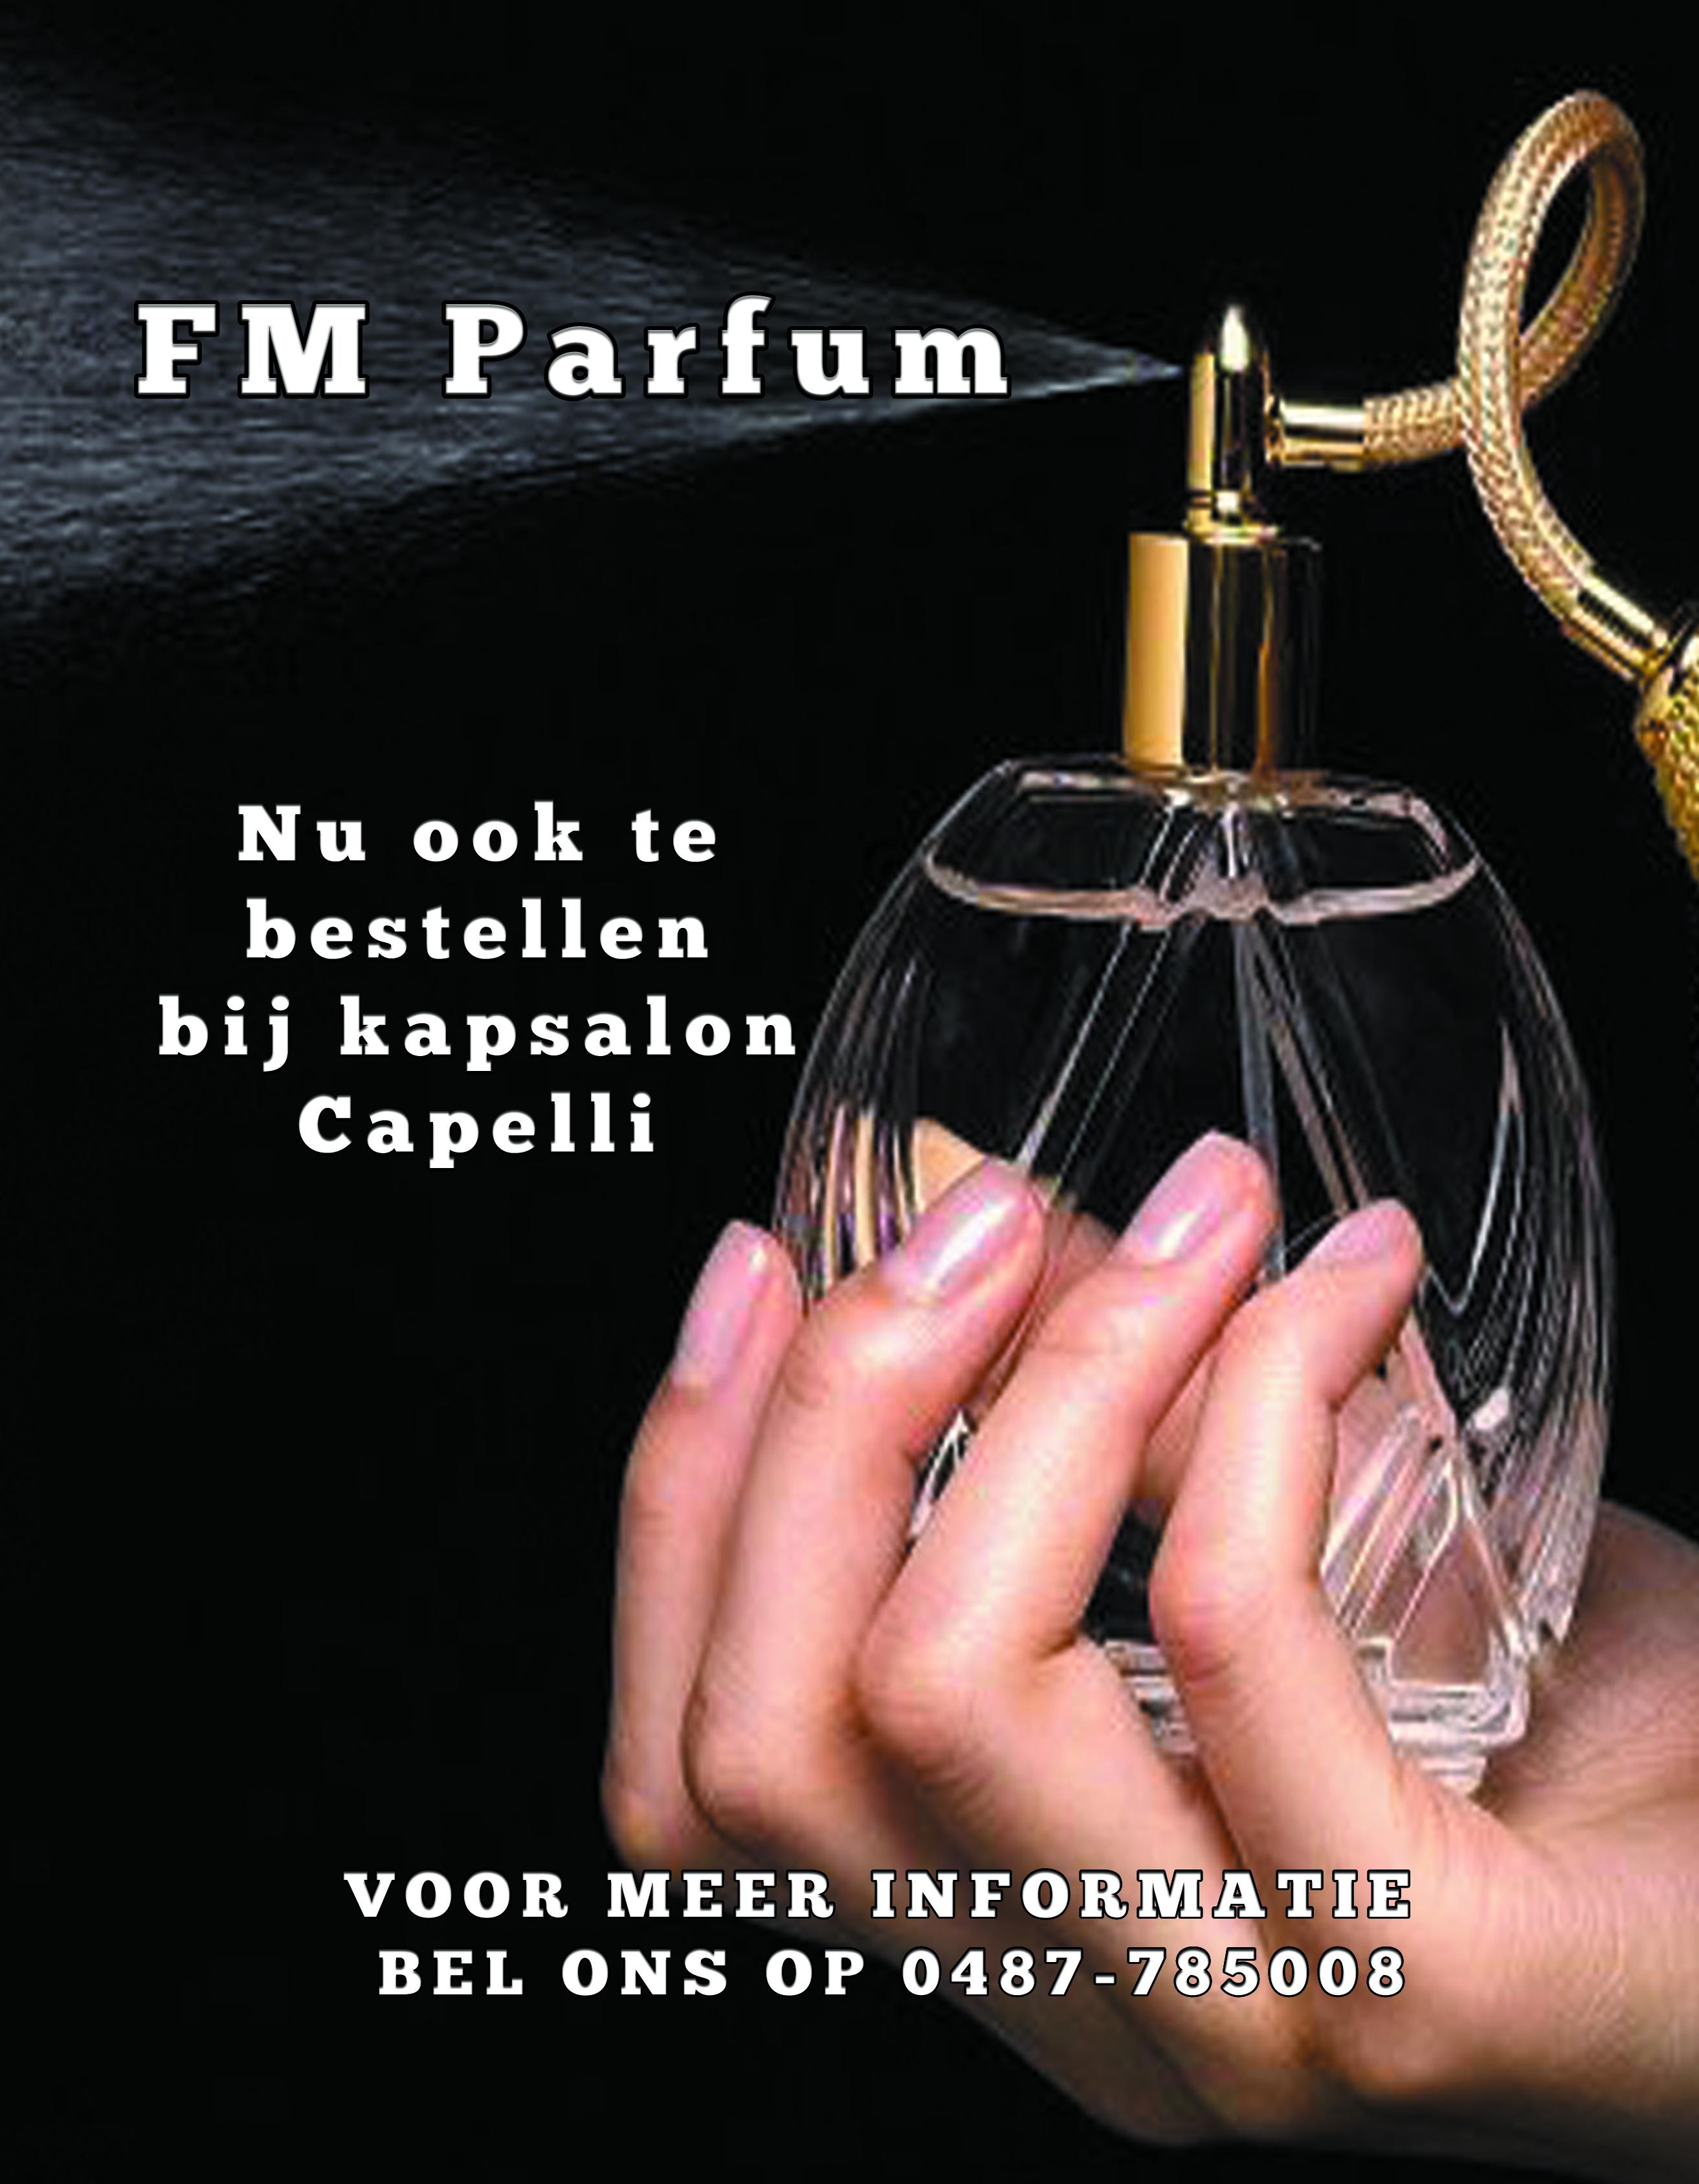 Nieuw bij kapsalon Capelli          FM Parfum